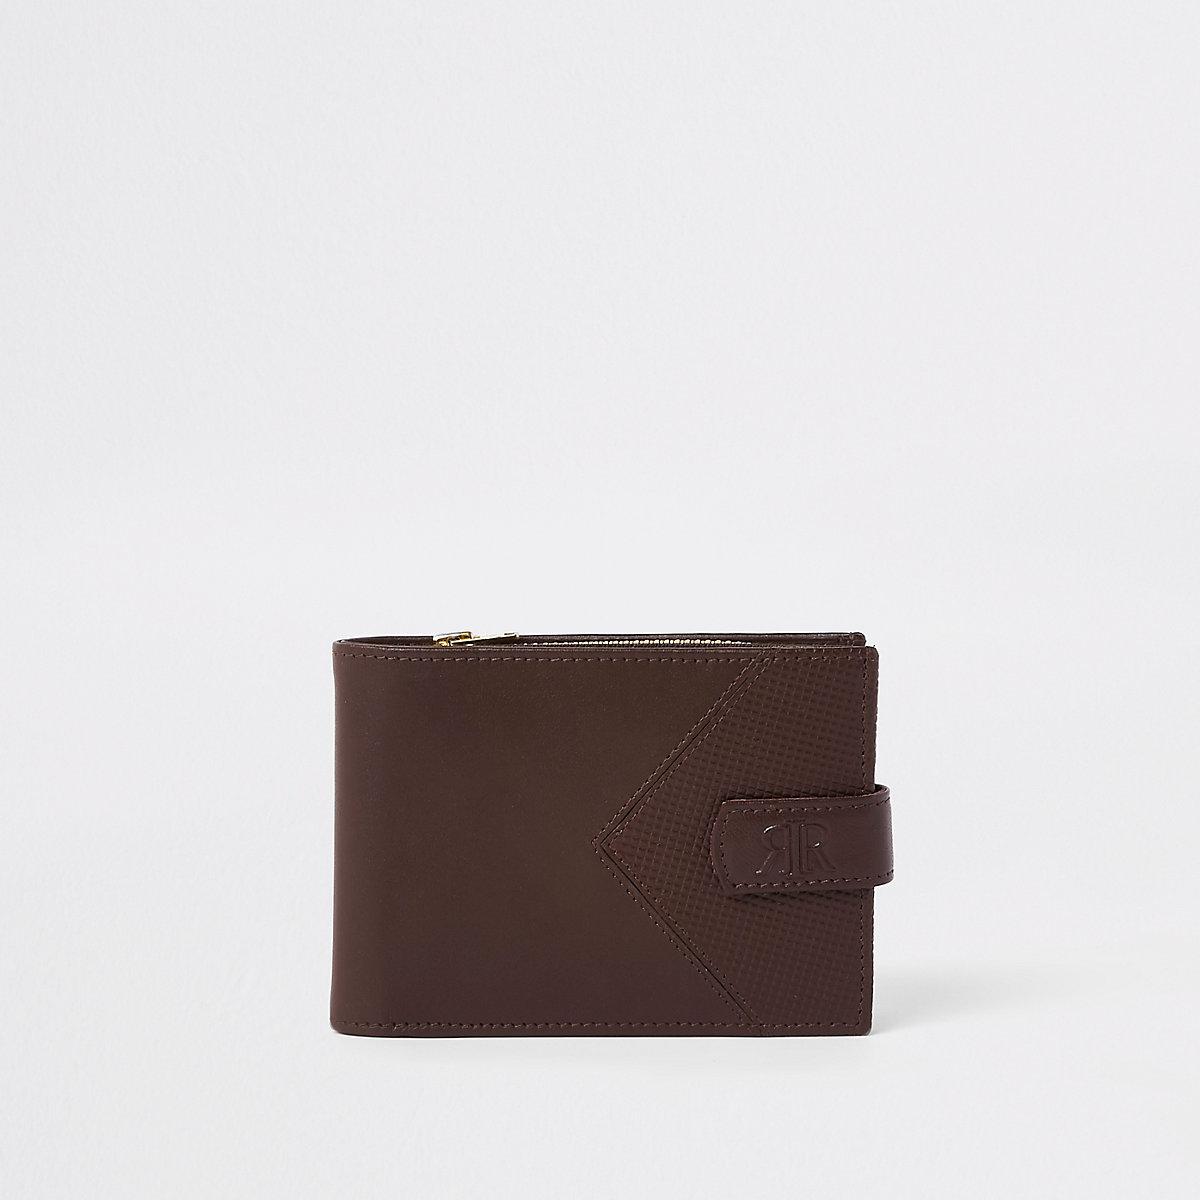 Brown leather chevron RI wallet